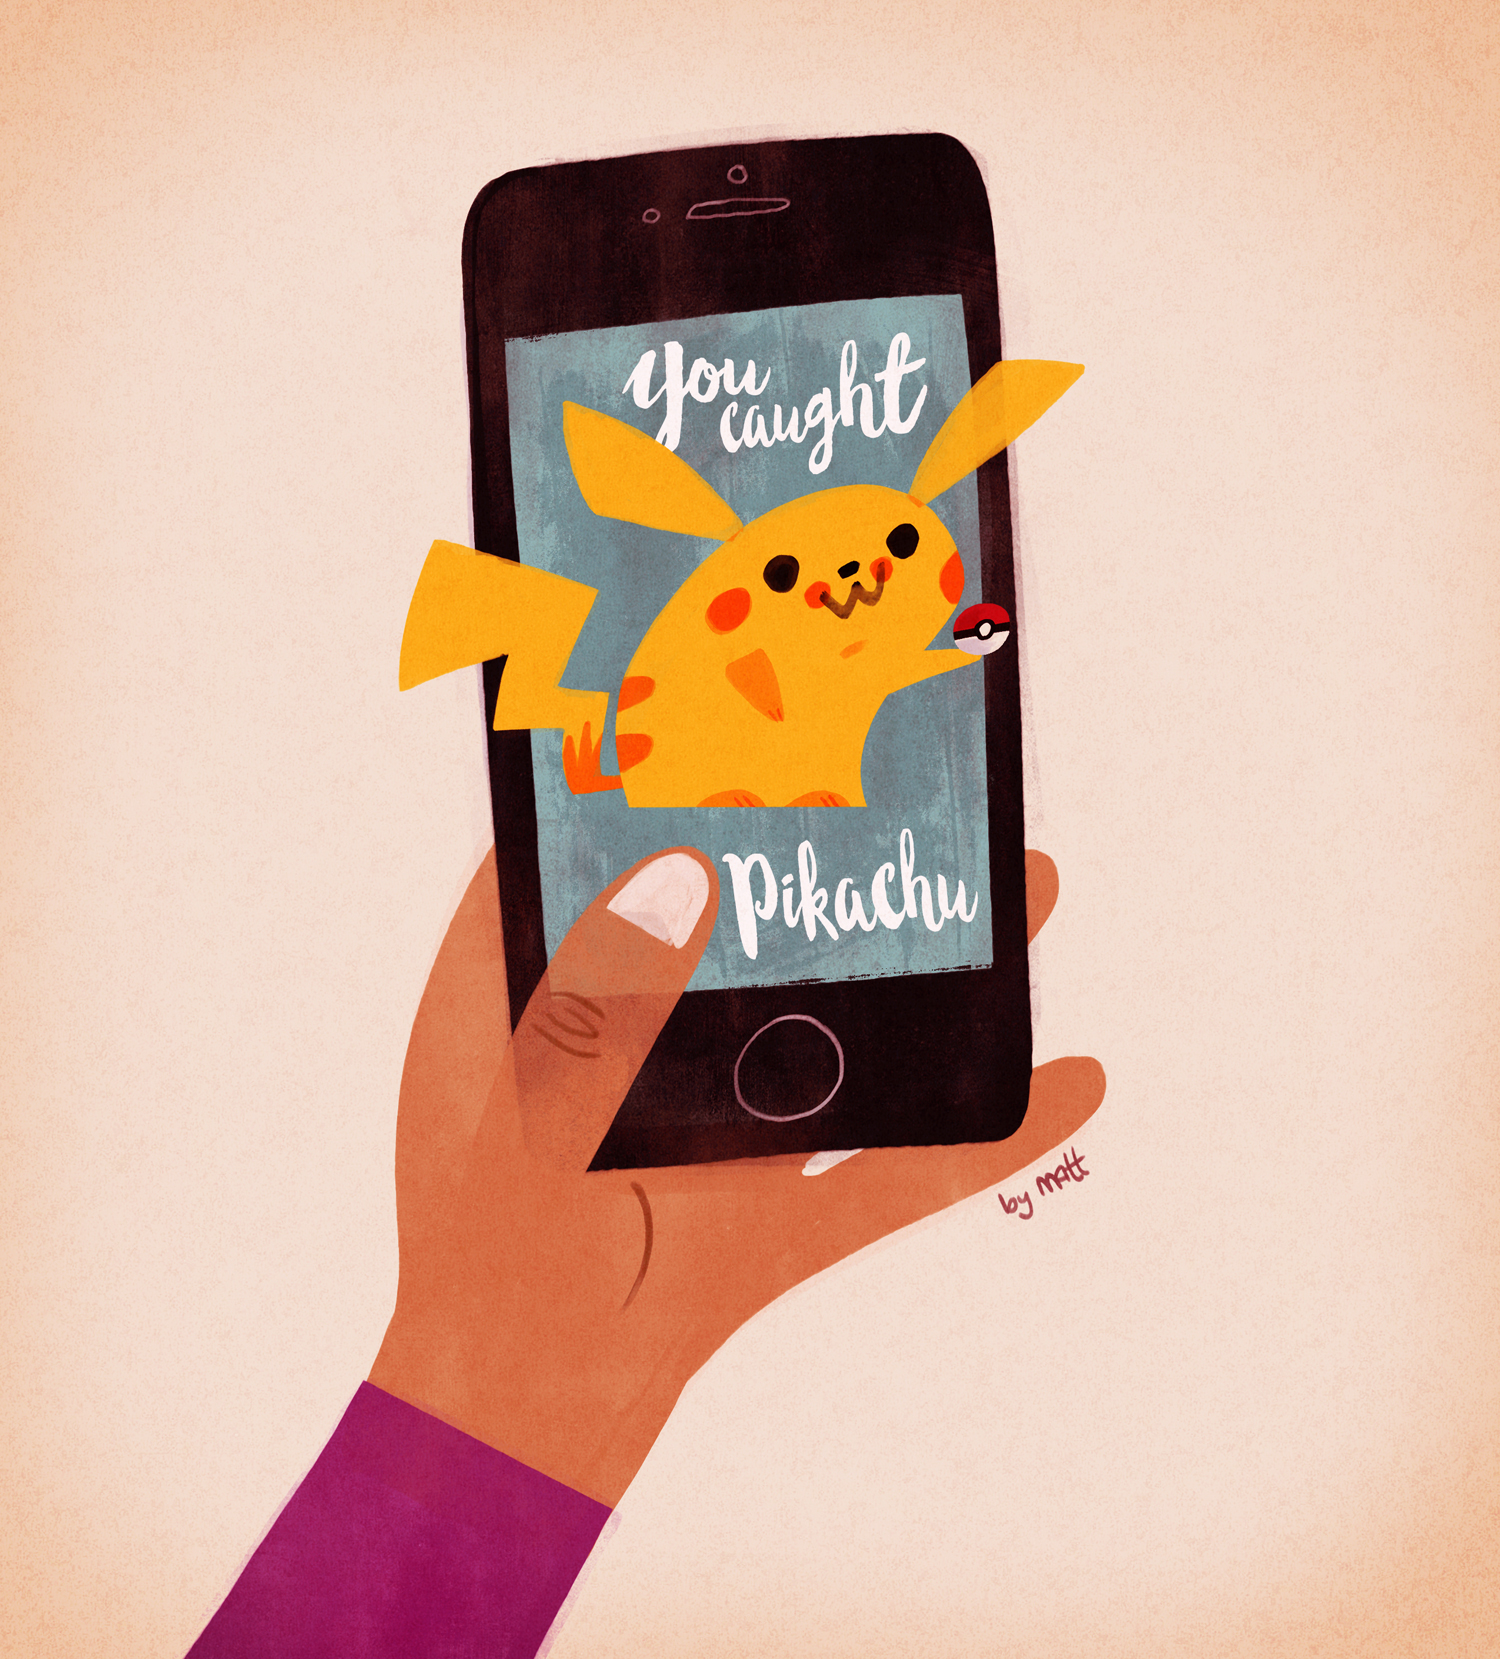 pikachu2.jpg by Matt Kaufenberg